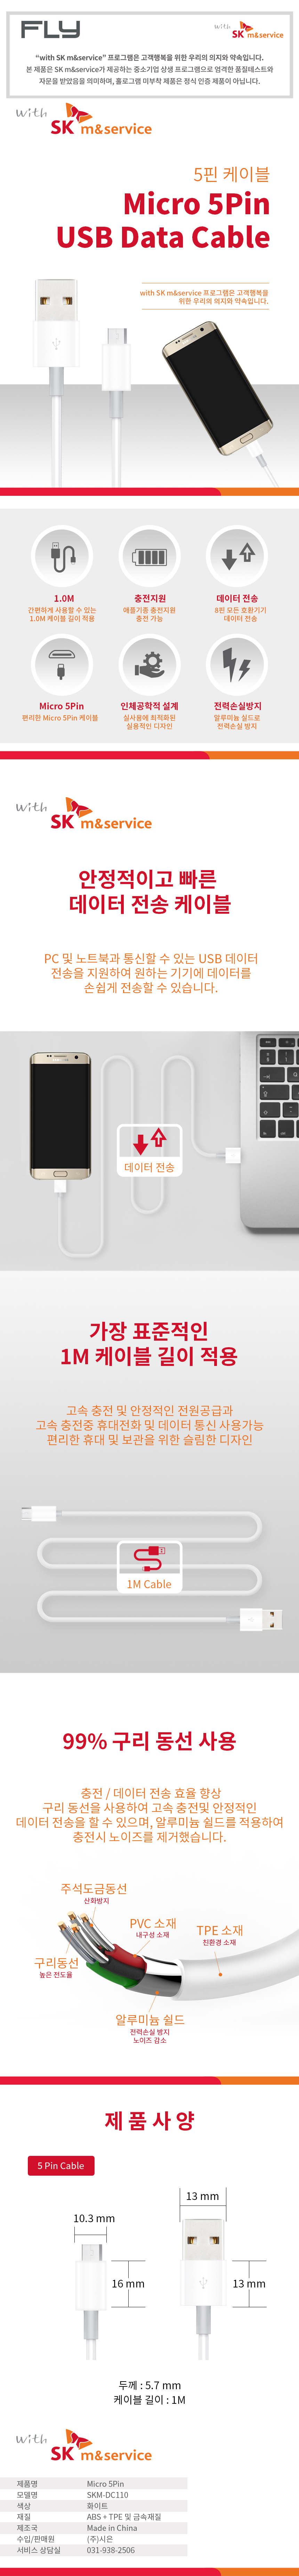 FLY  with SK엠앤서비스 마이크로 5핀 케이블 (SKM-DC110)(1m)